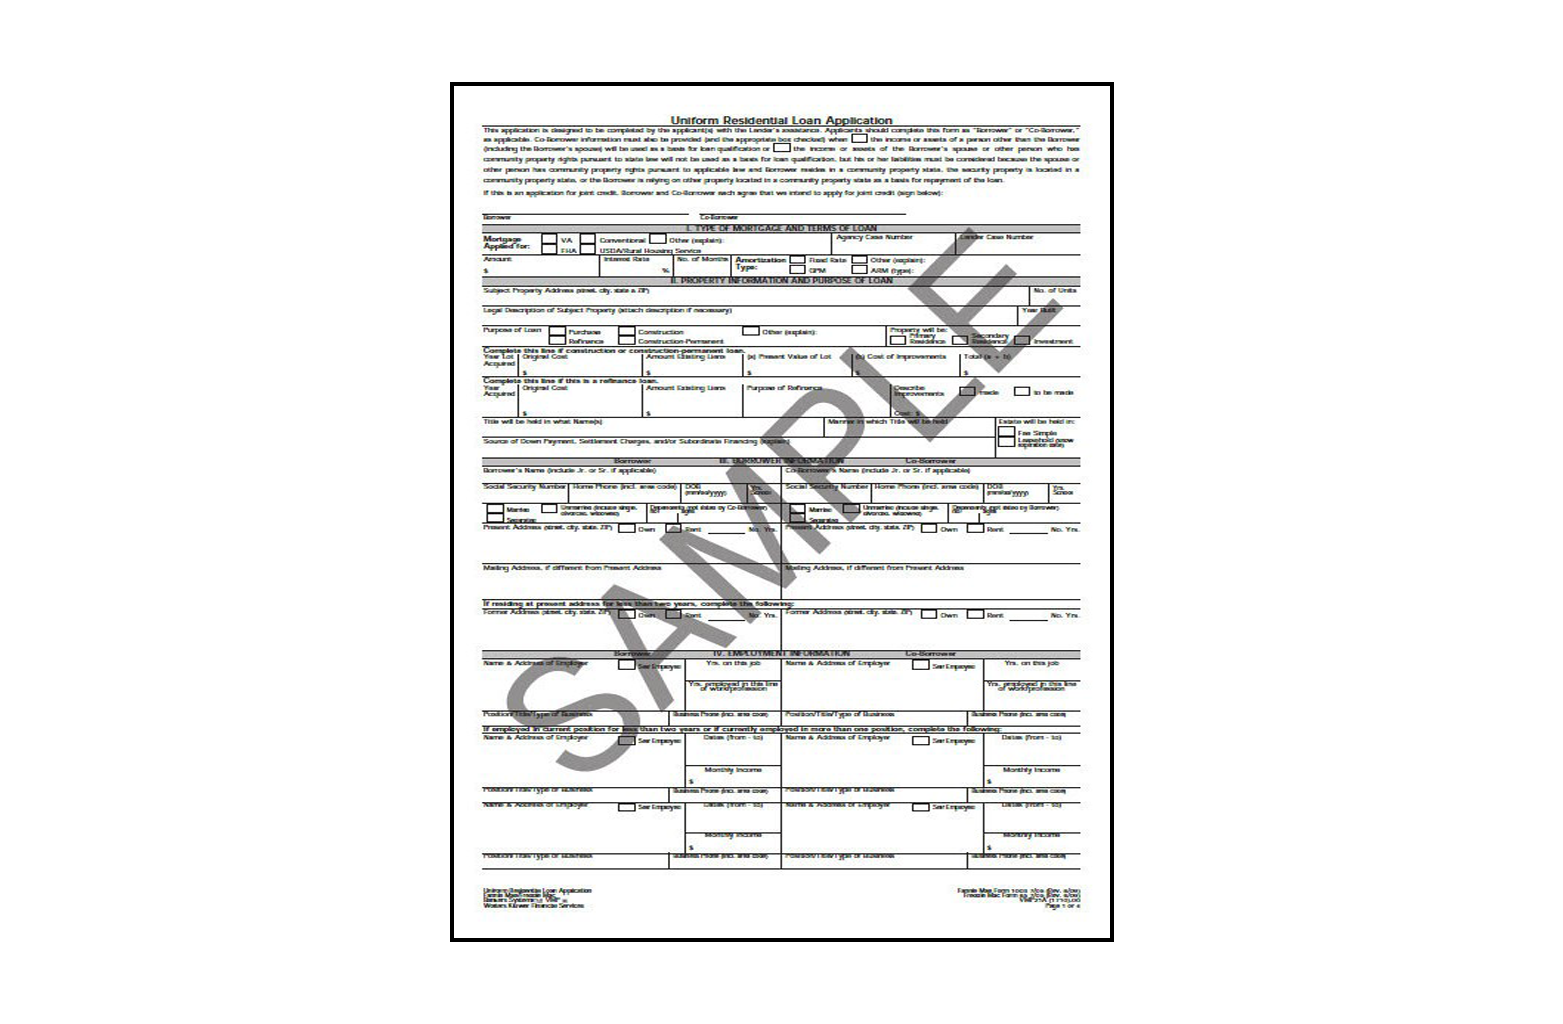 Uniform Residential Loan Application Interim